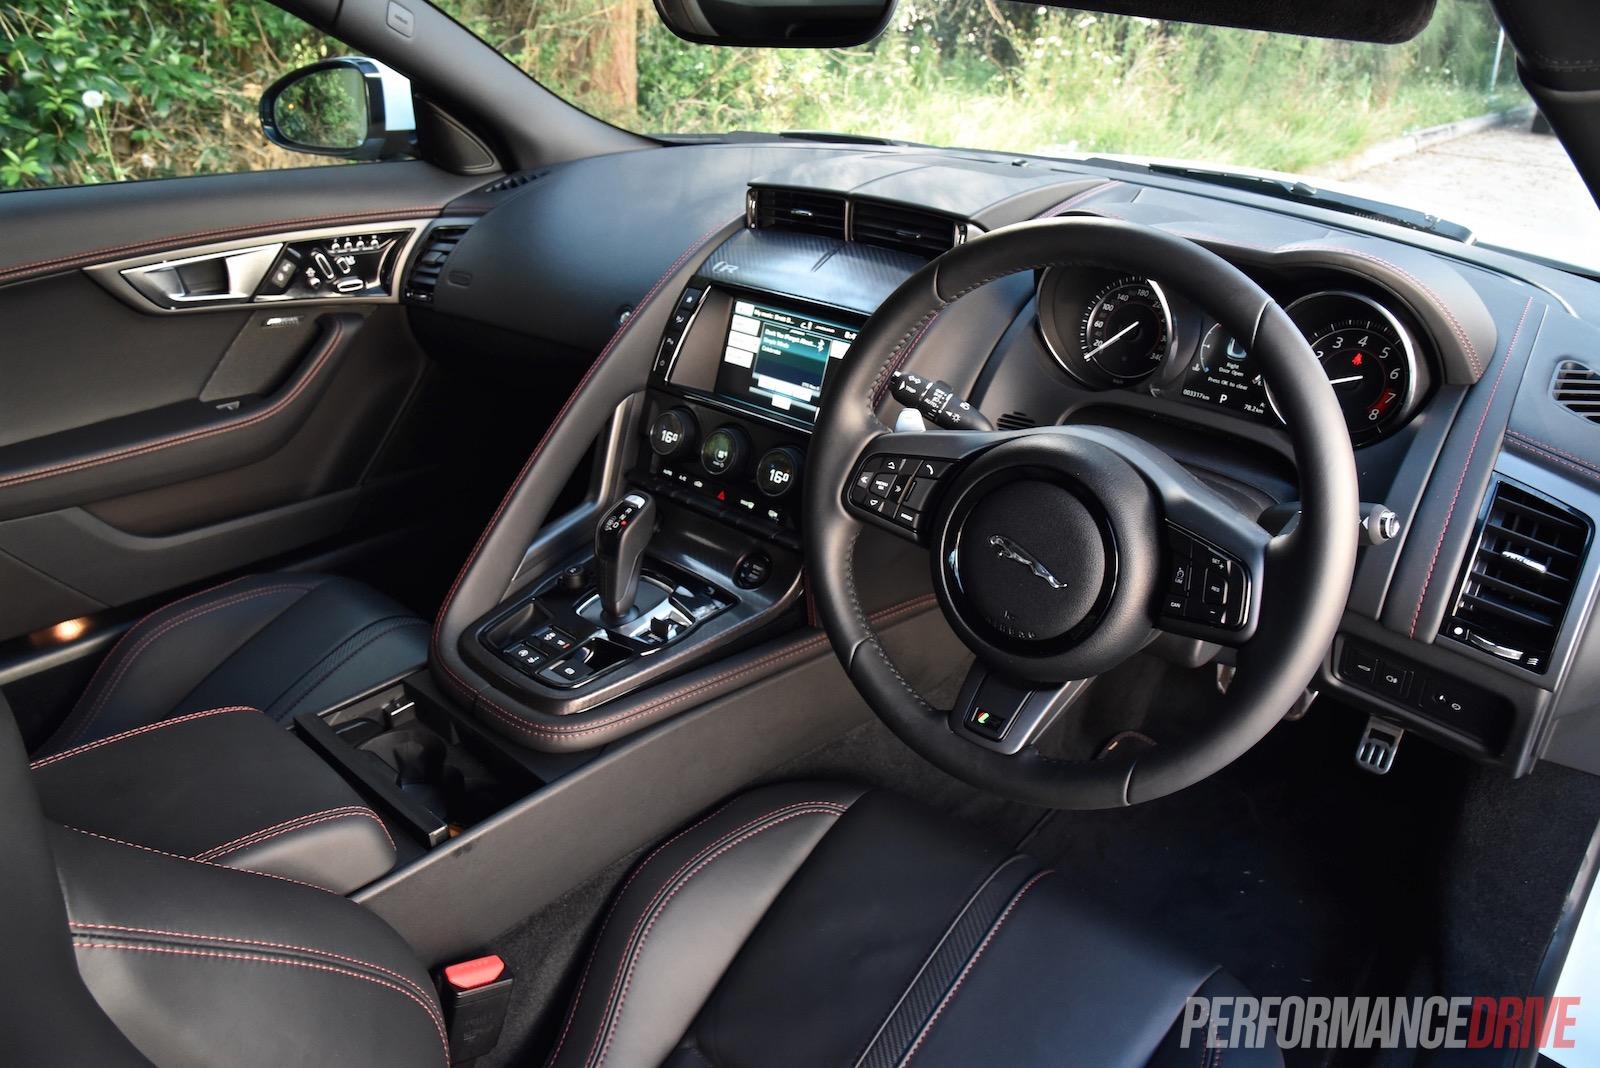 2016 jaguar f type r awd review video performancedrive - Jaguar f type r coupe interior ...